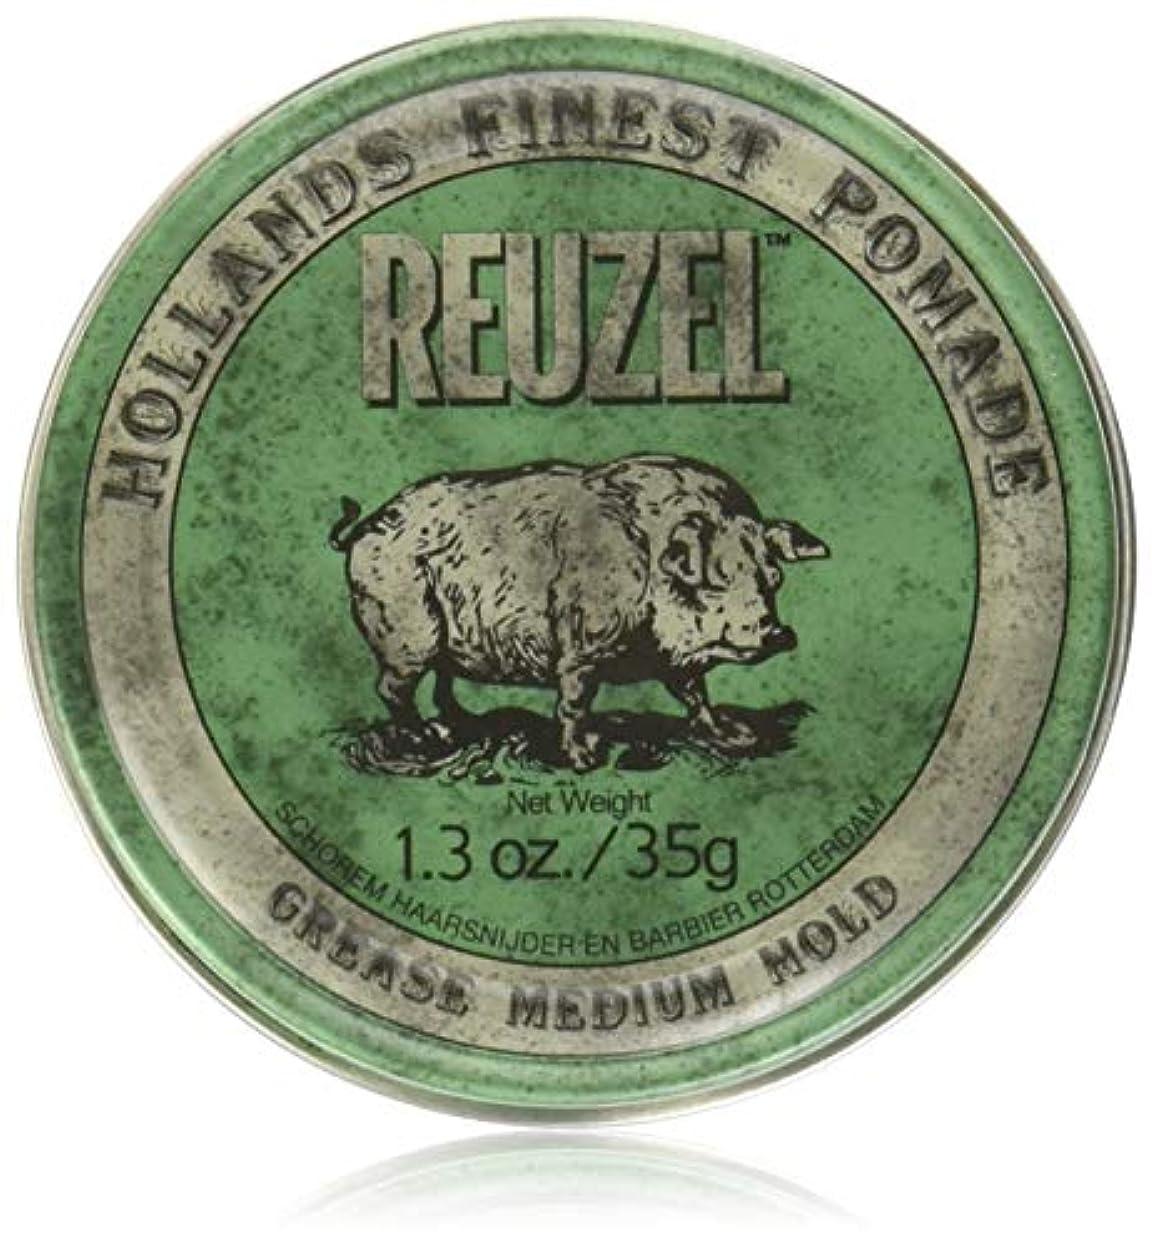 西致命的発表REUZEL Grease Hold Hair Styling Pomade Piglet Wax/Gel, Medium, Green, 1.3 oz, 35g by REUZEL